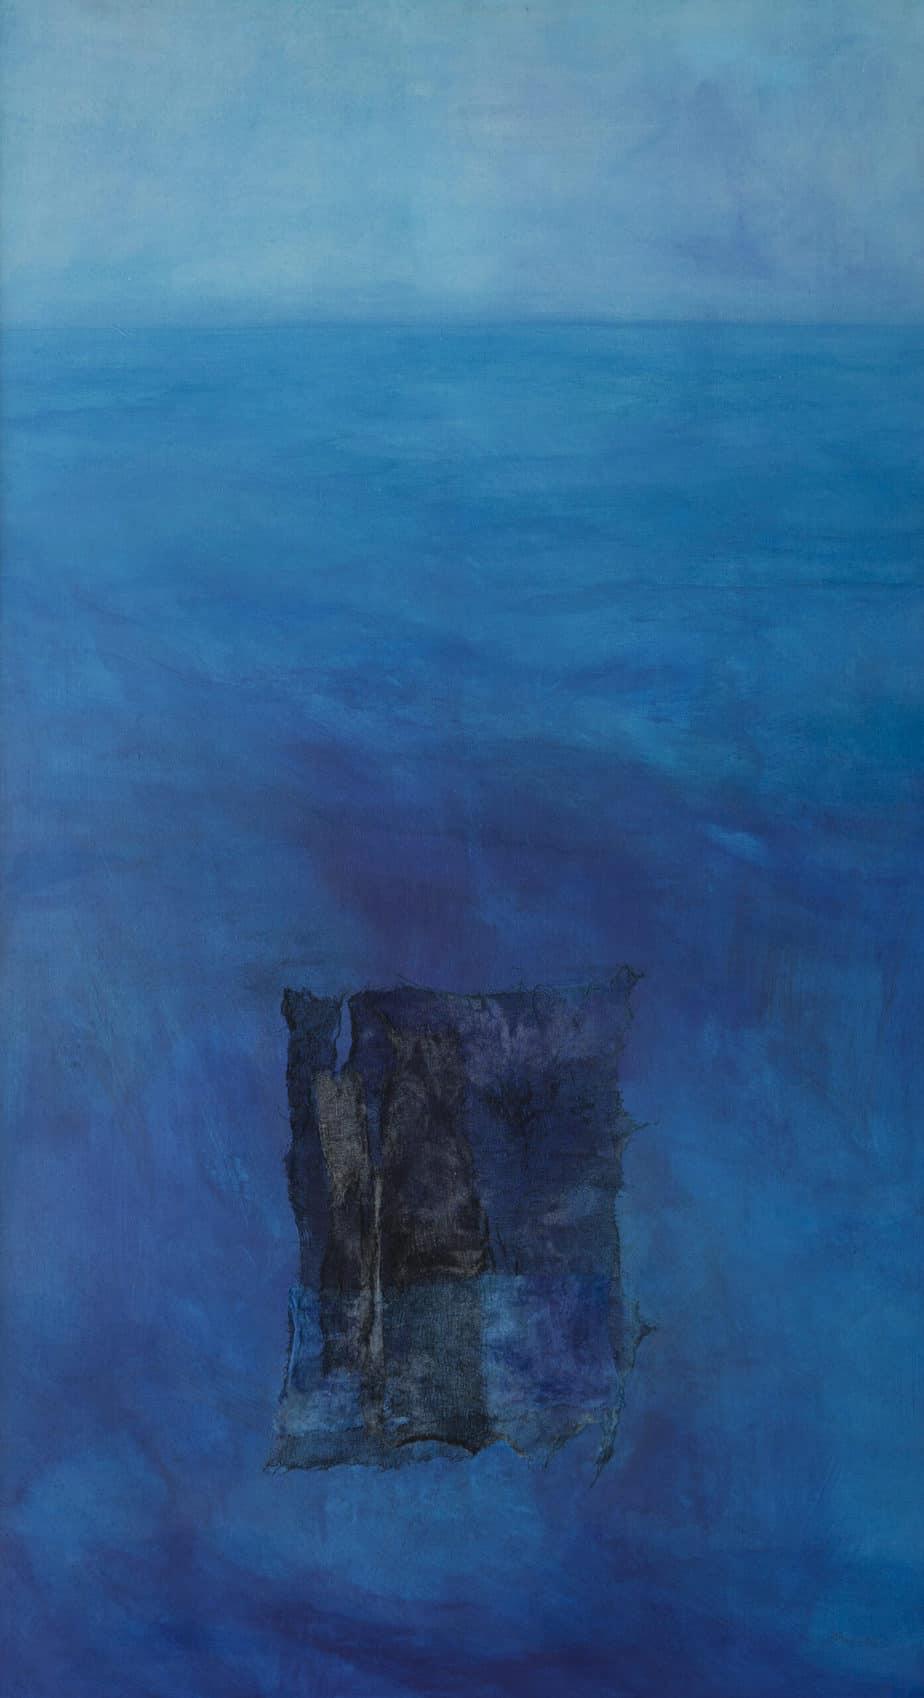 Grande blu profondo Image